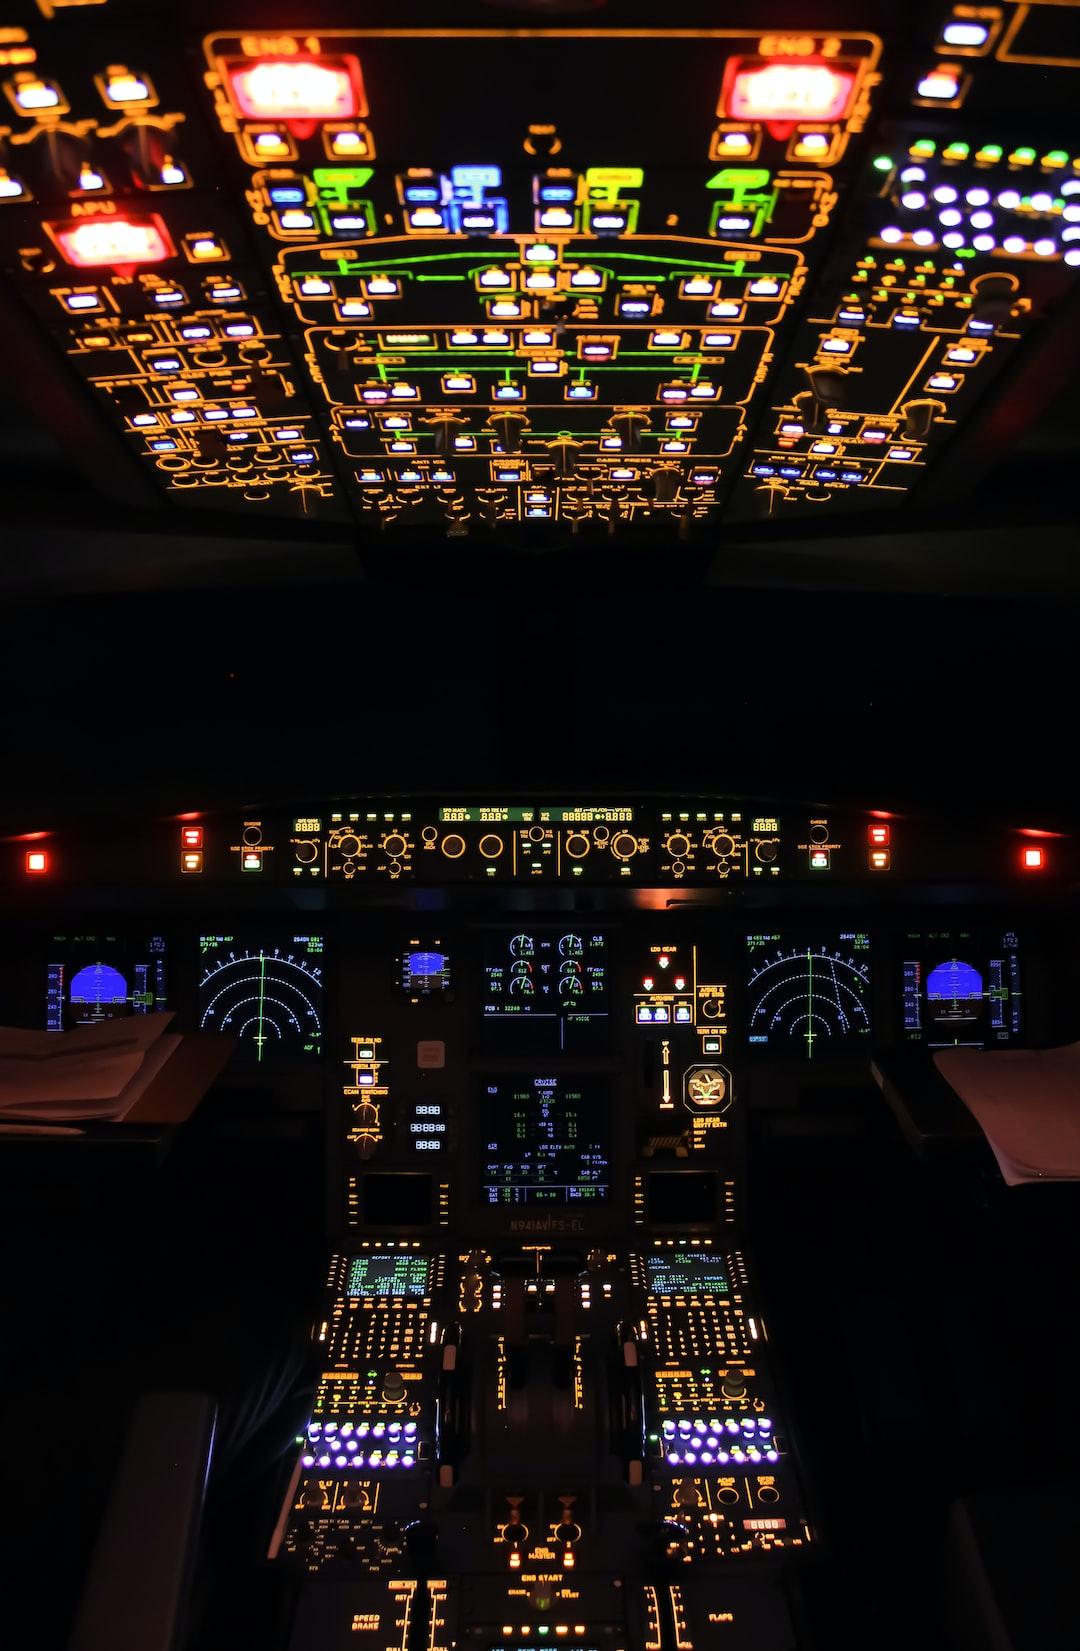 Cockpit annunciator lights test